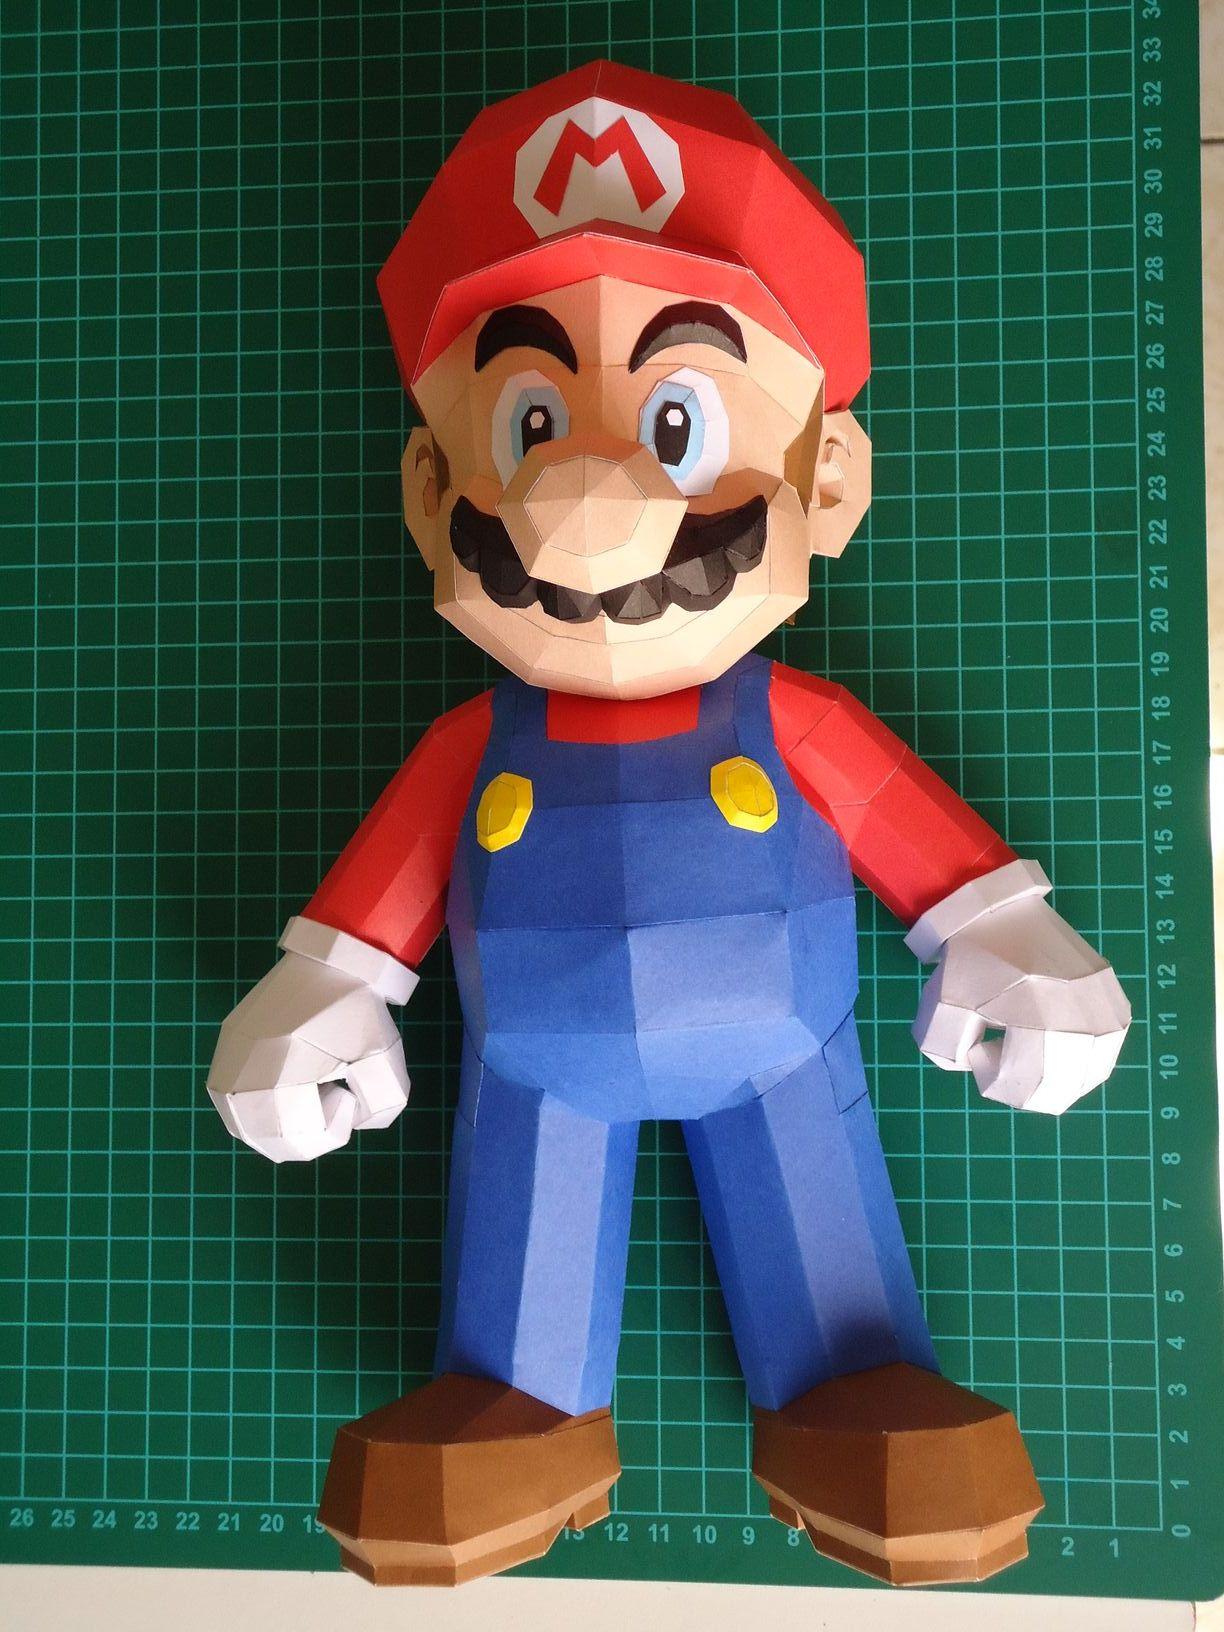 Super Mario Bros. Deluxe - Super Mario Wiki, the Mario Super mario pictures to print